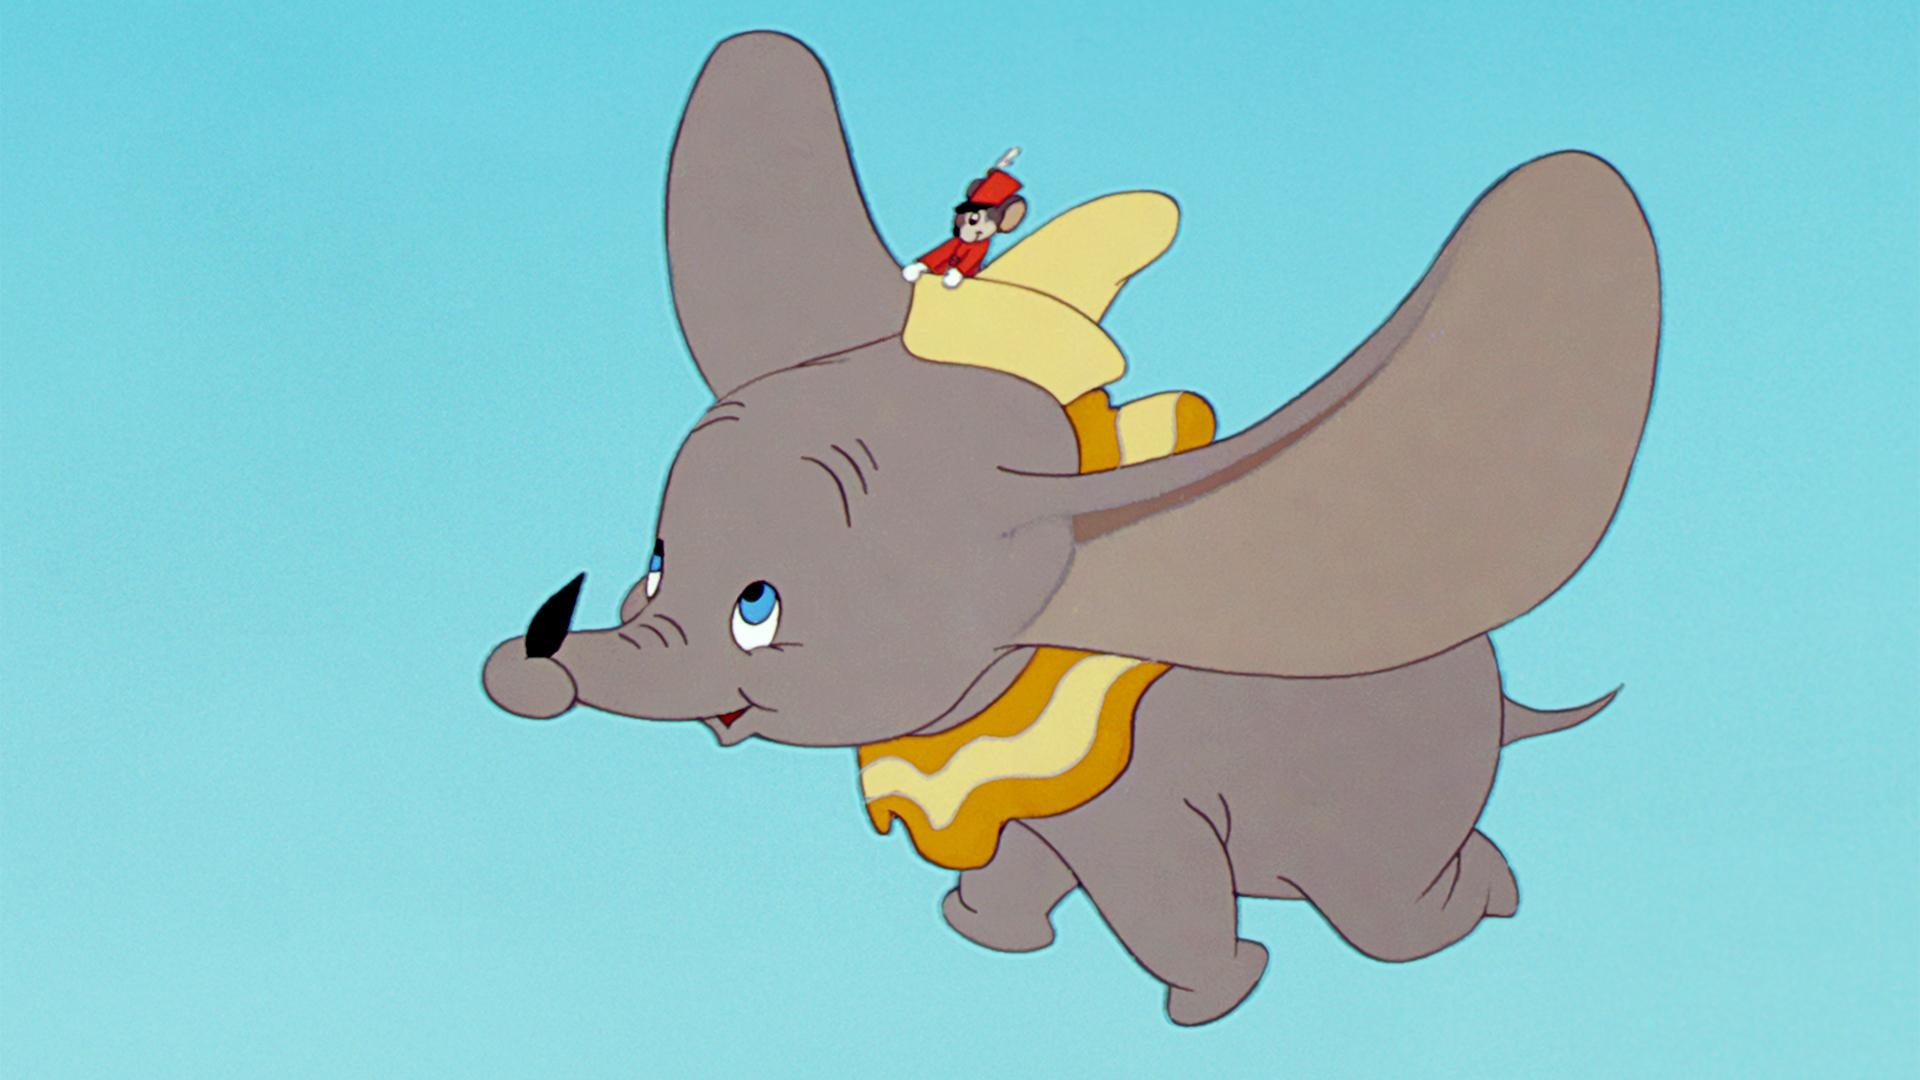 Disney Developing Live-Action 'Dumbo' Movie